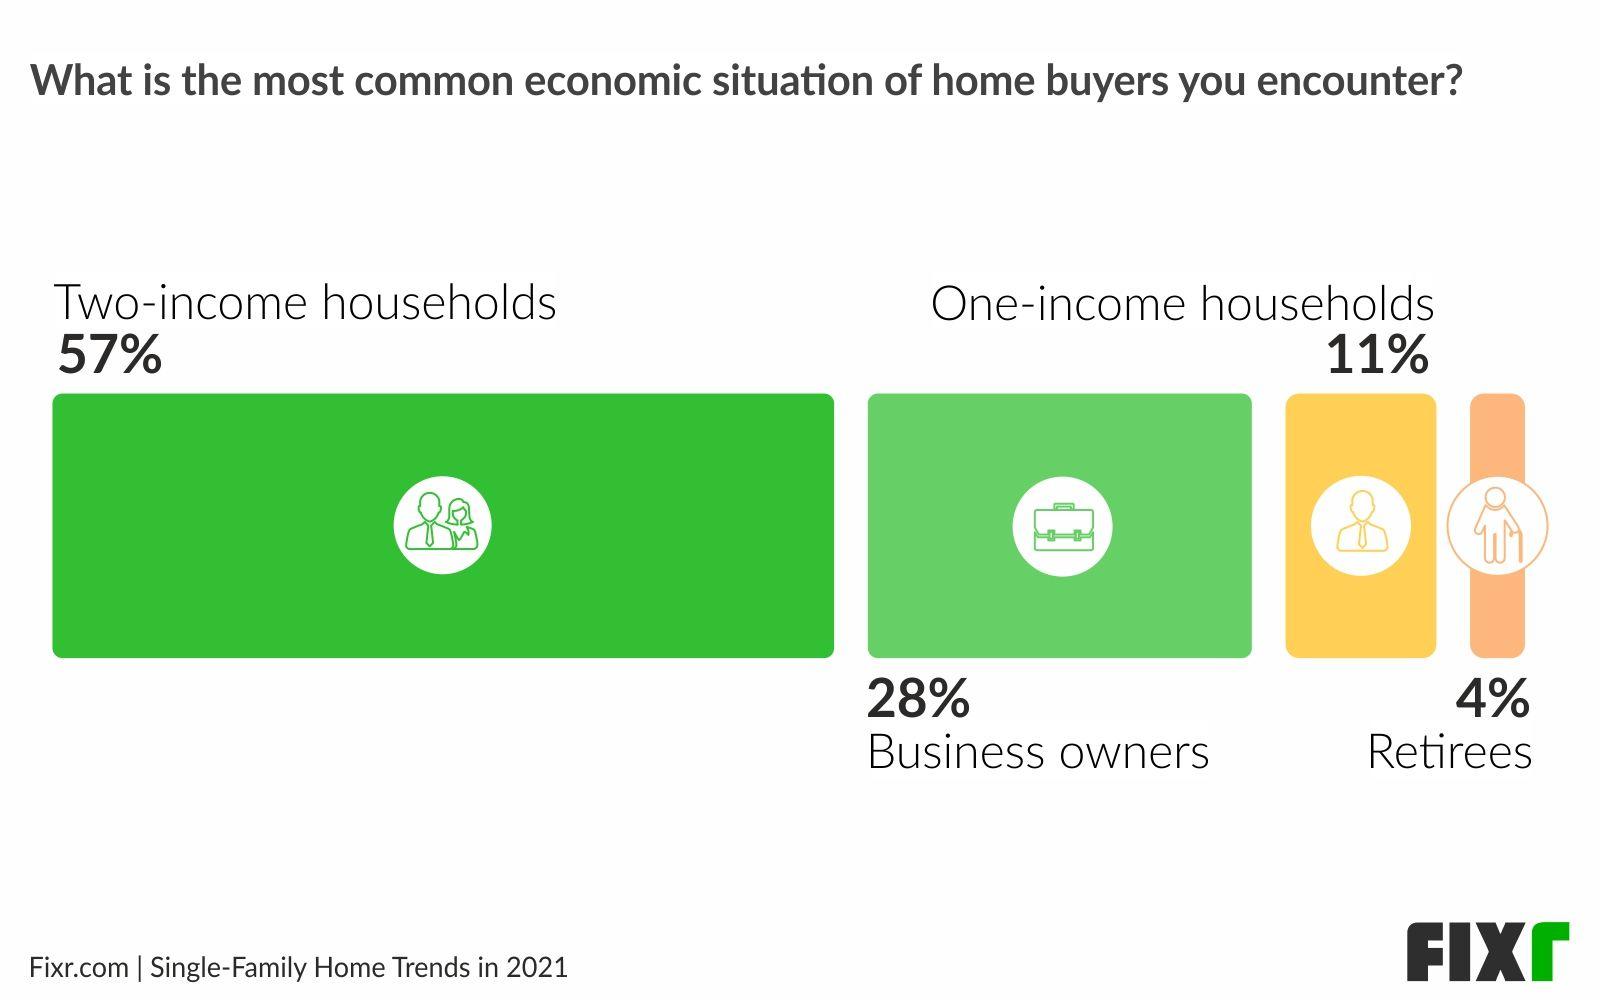 Home buyers 2021 - Economic situation